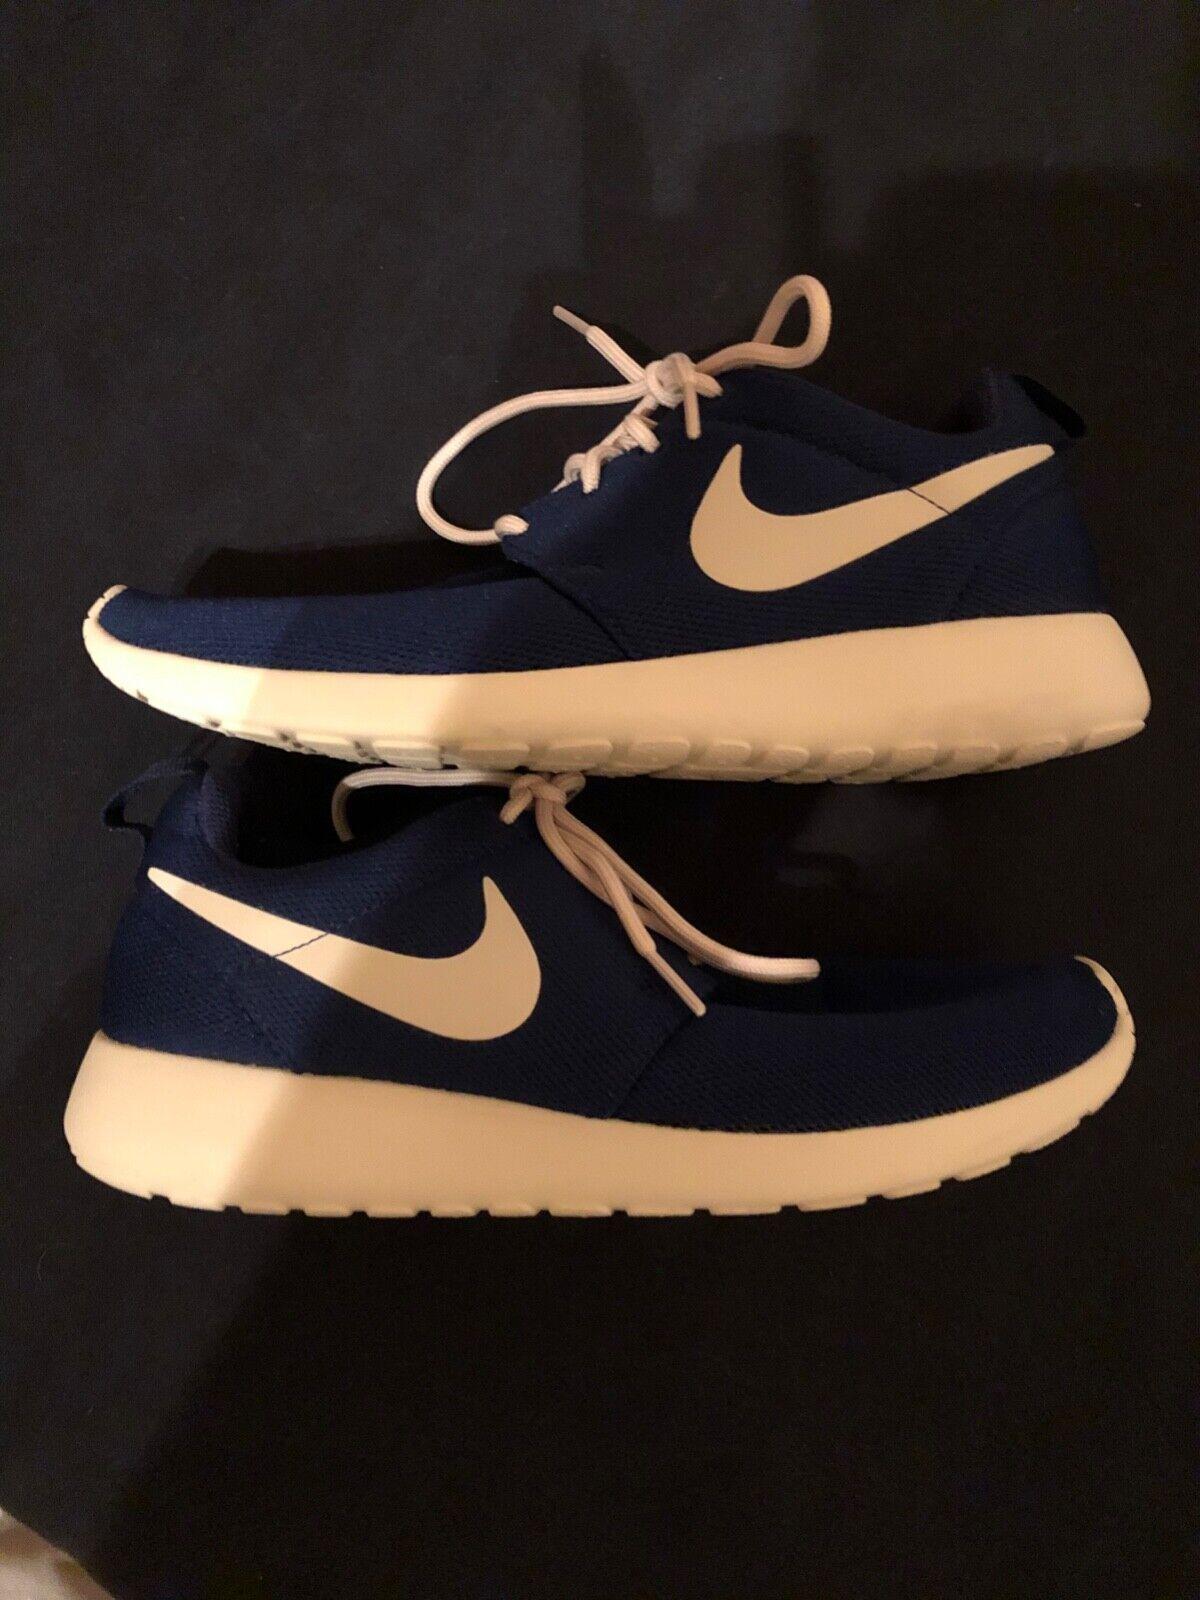 Nike Damen Roshe Schuhe Größe 40 Farbe  Dunkelblau-Weiß Super Zustand Schuhe